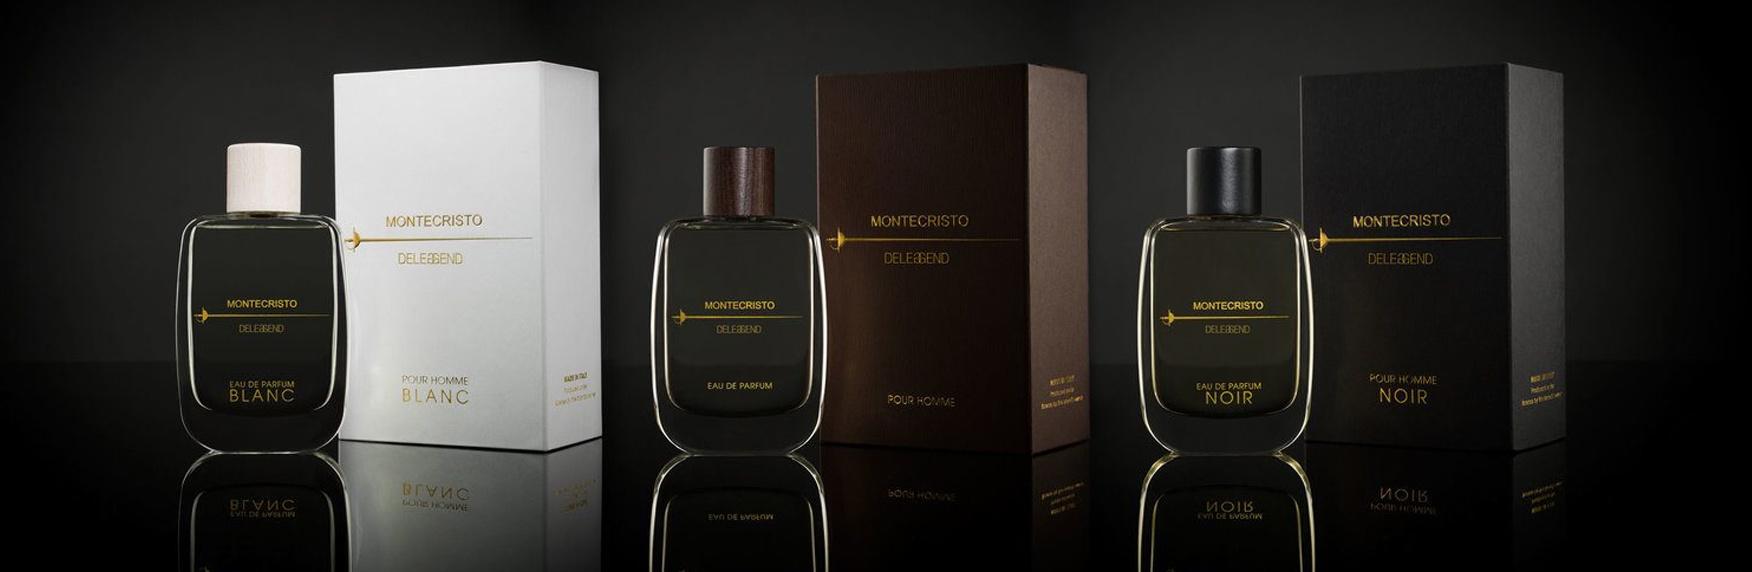 Meet the Brand: MONTECRISTO DELEGGEND